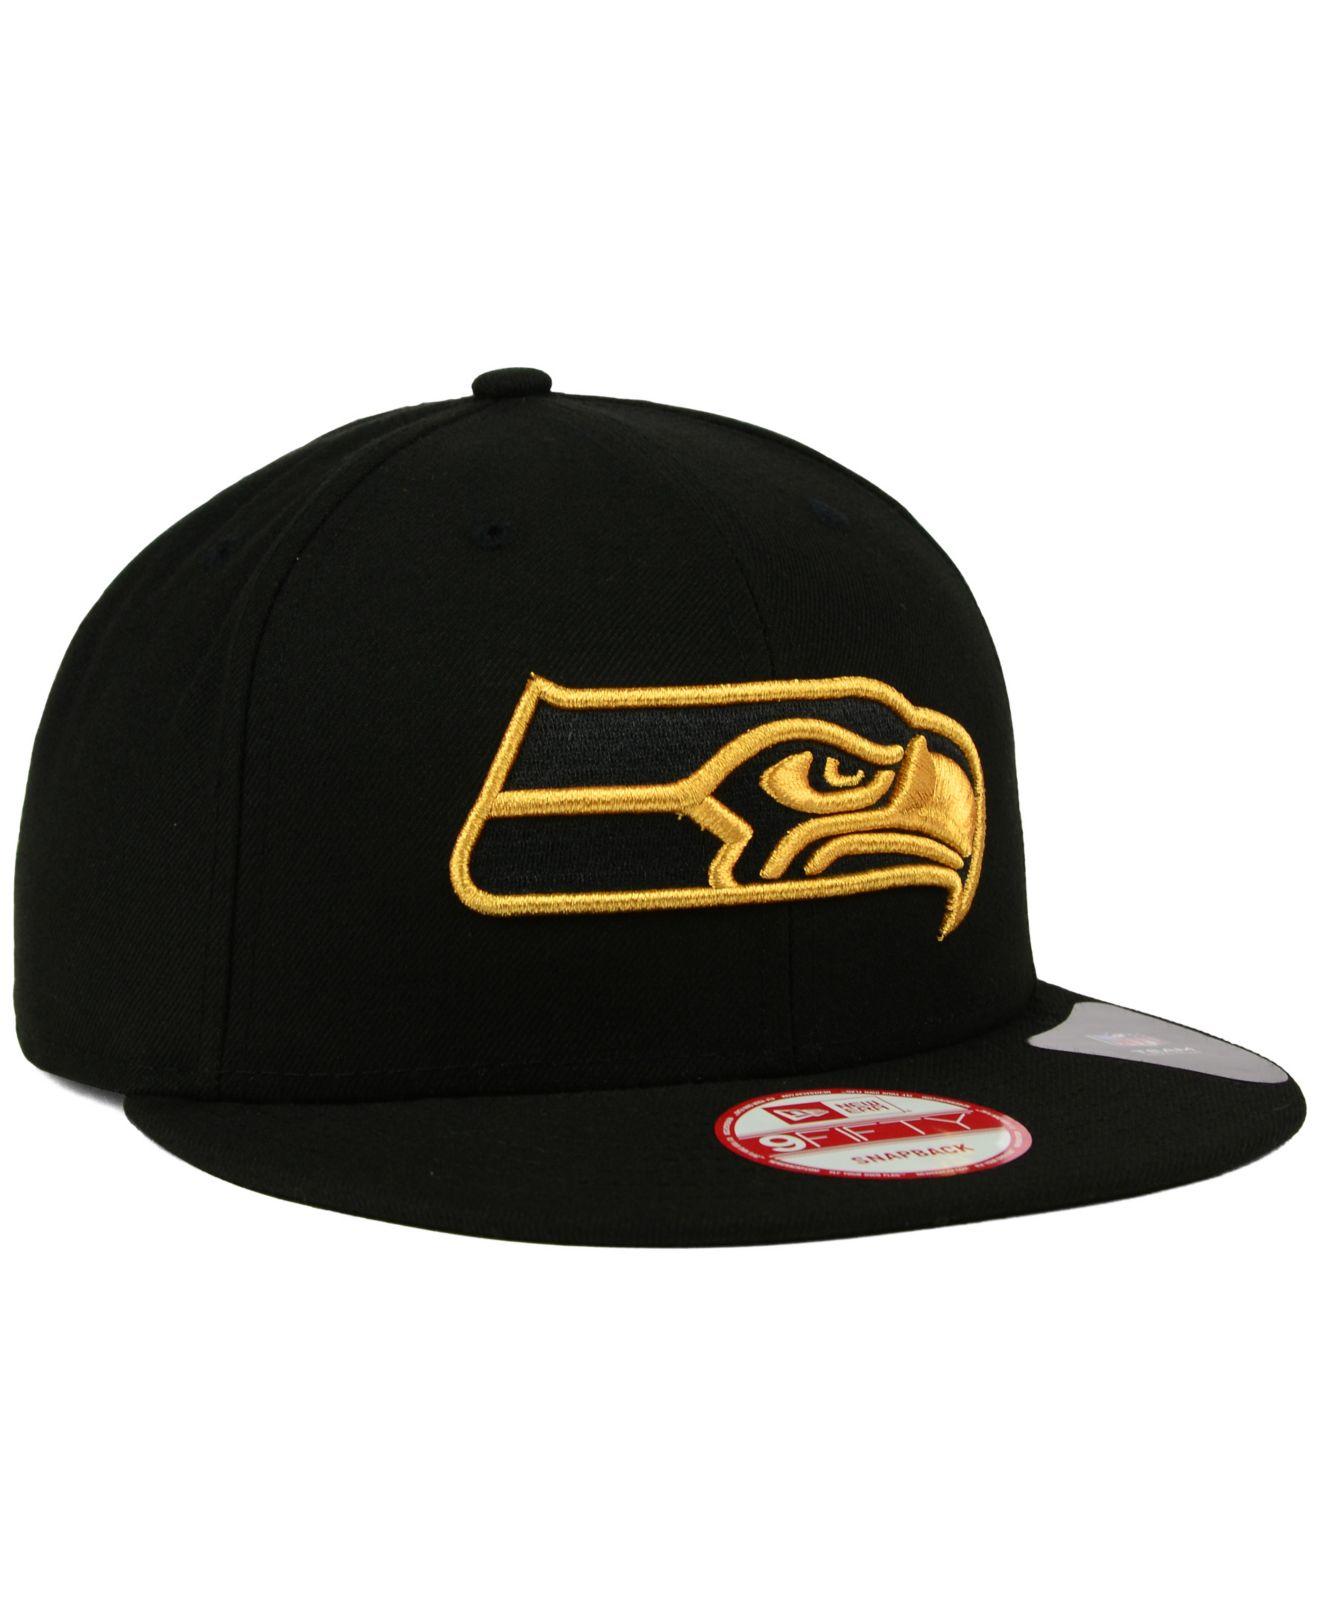 61567c658 Lyst - KTZ Seattle Seahawks Black Metallic Gold 9fifty Snapback Cap ...